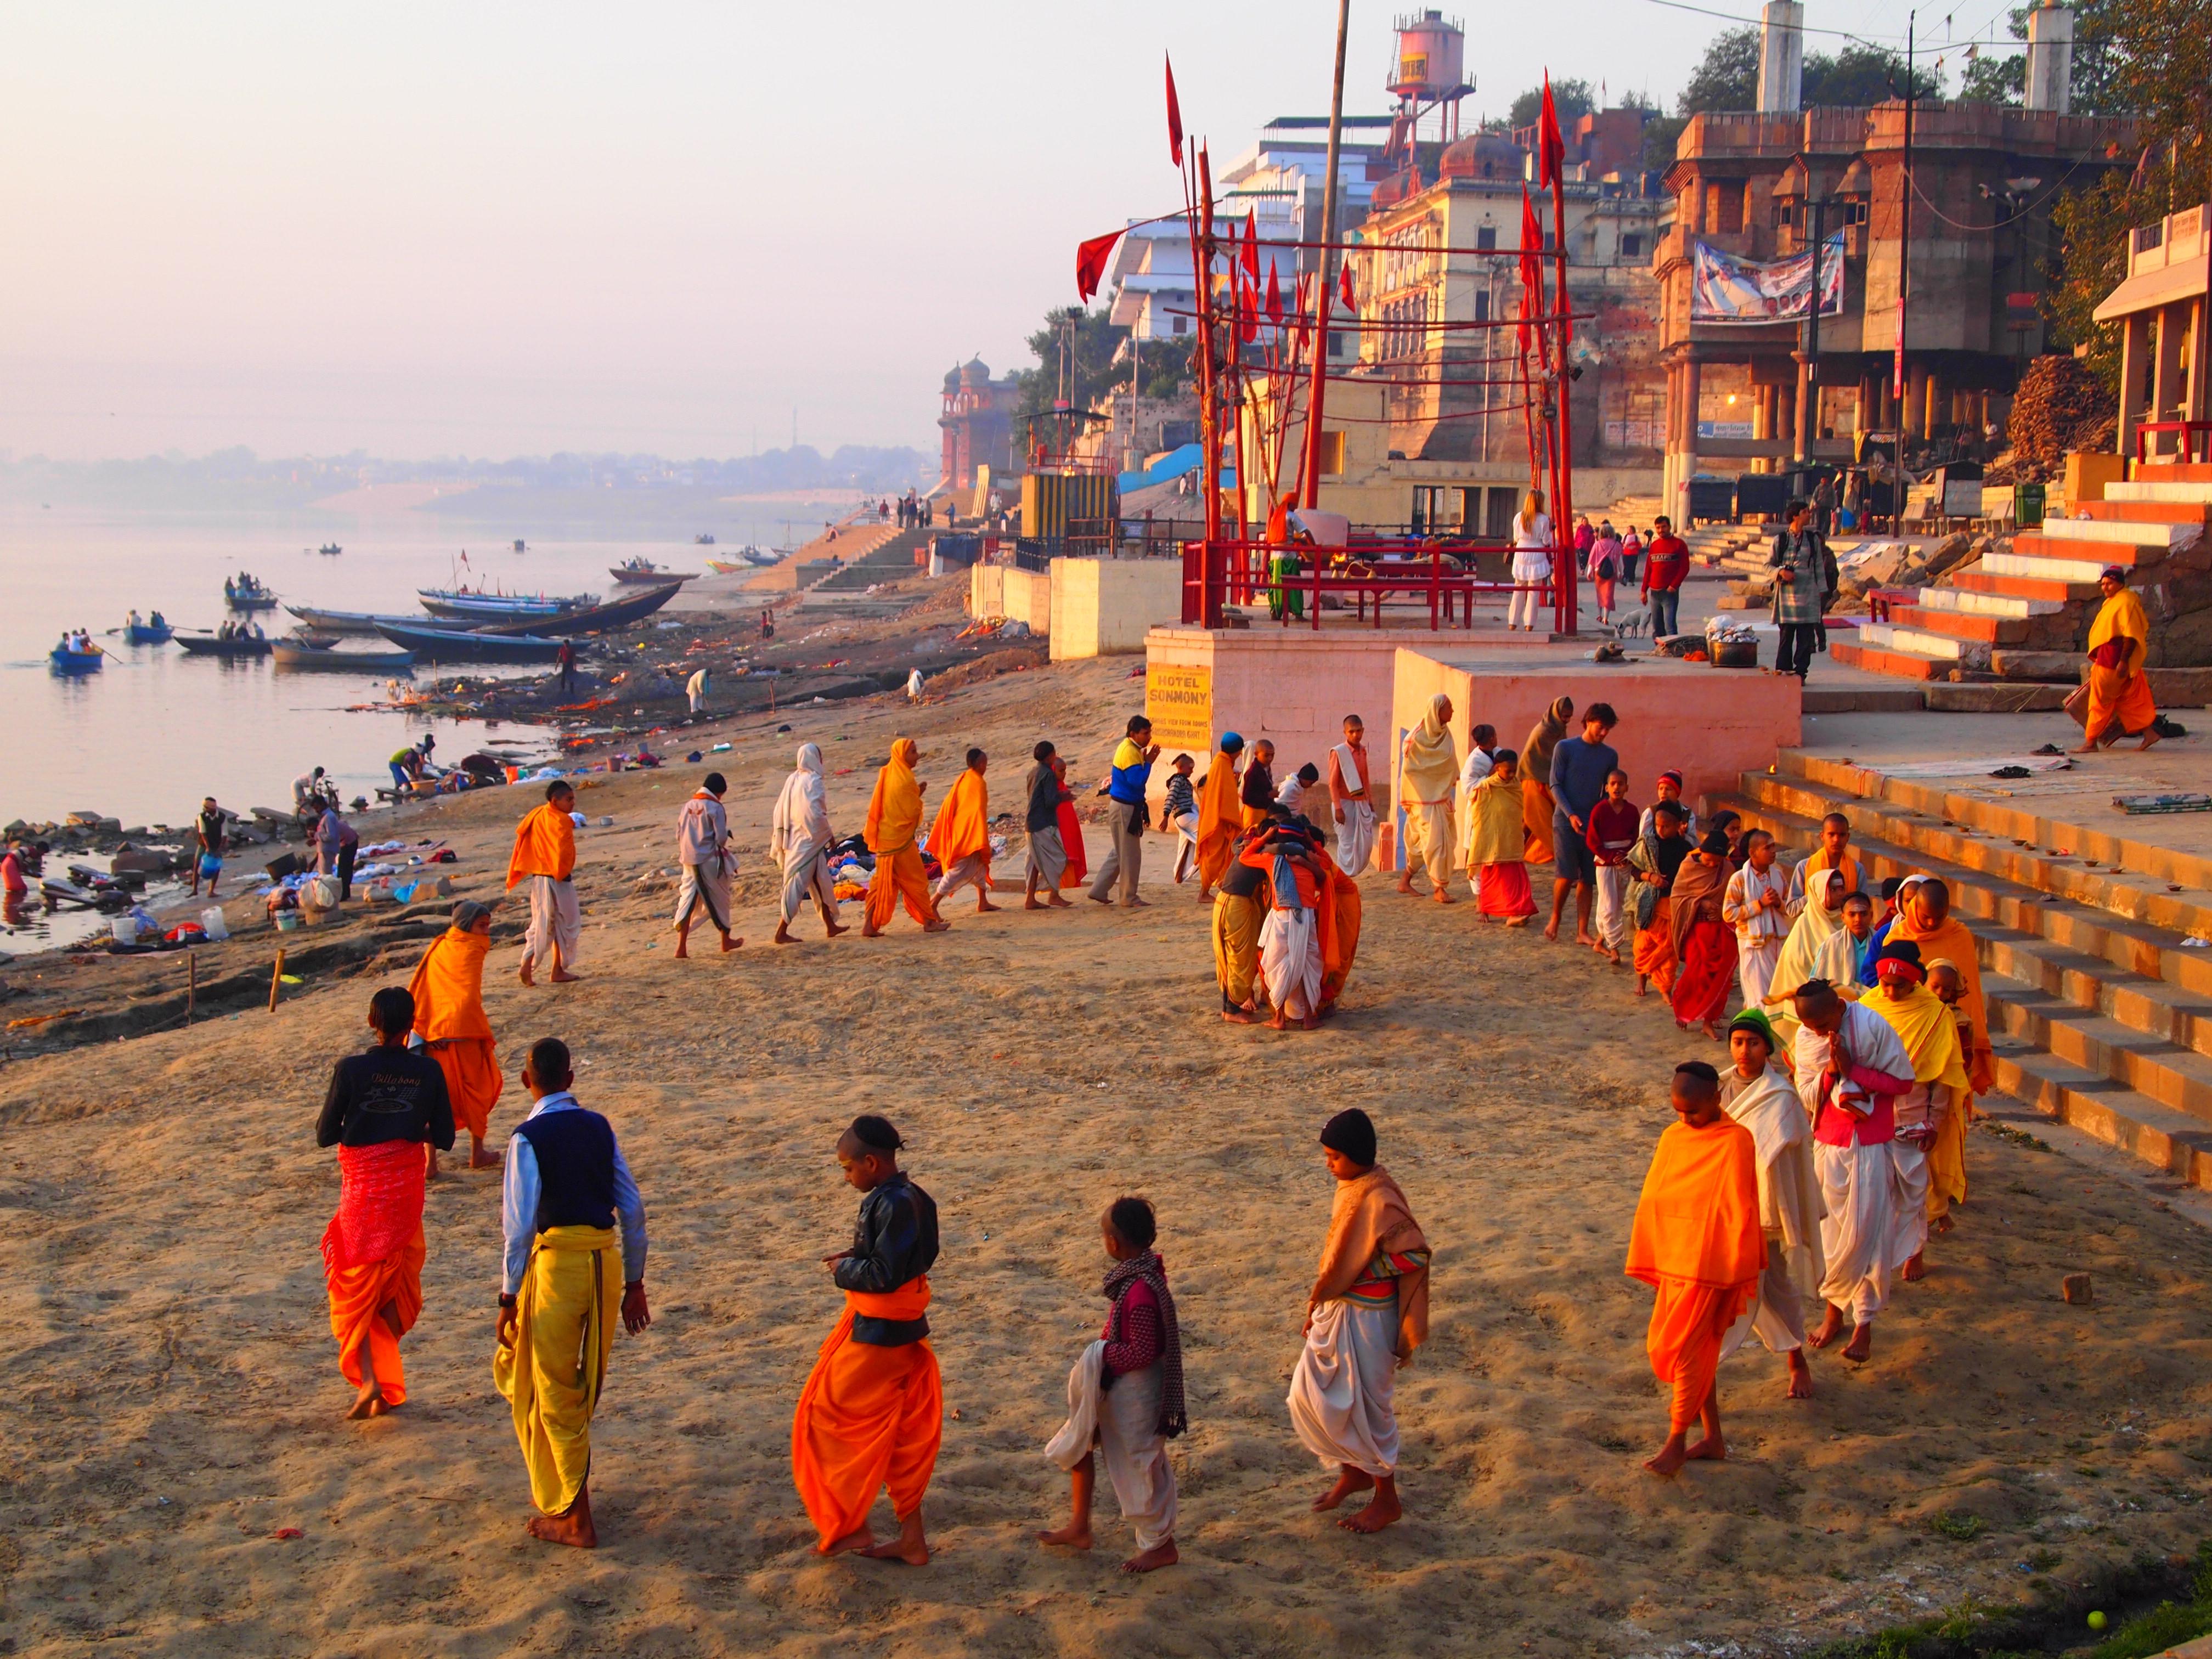 Morning in Varanasi, India. Photo by Rosie via http://rosie101010.wordpress.com/